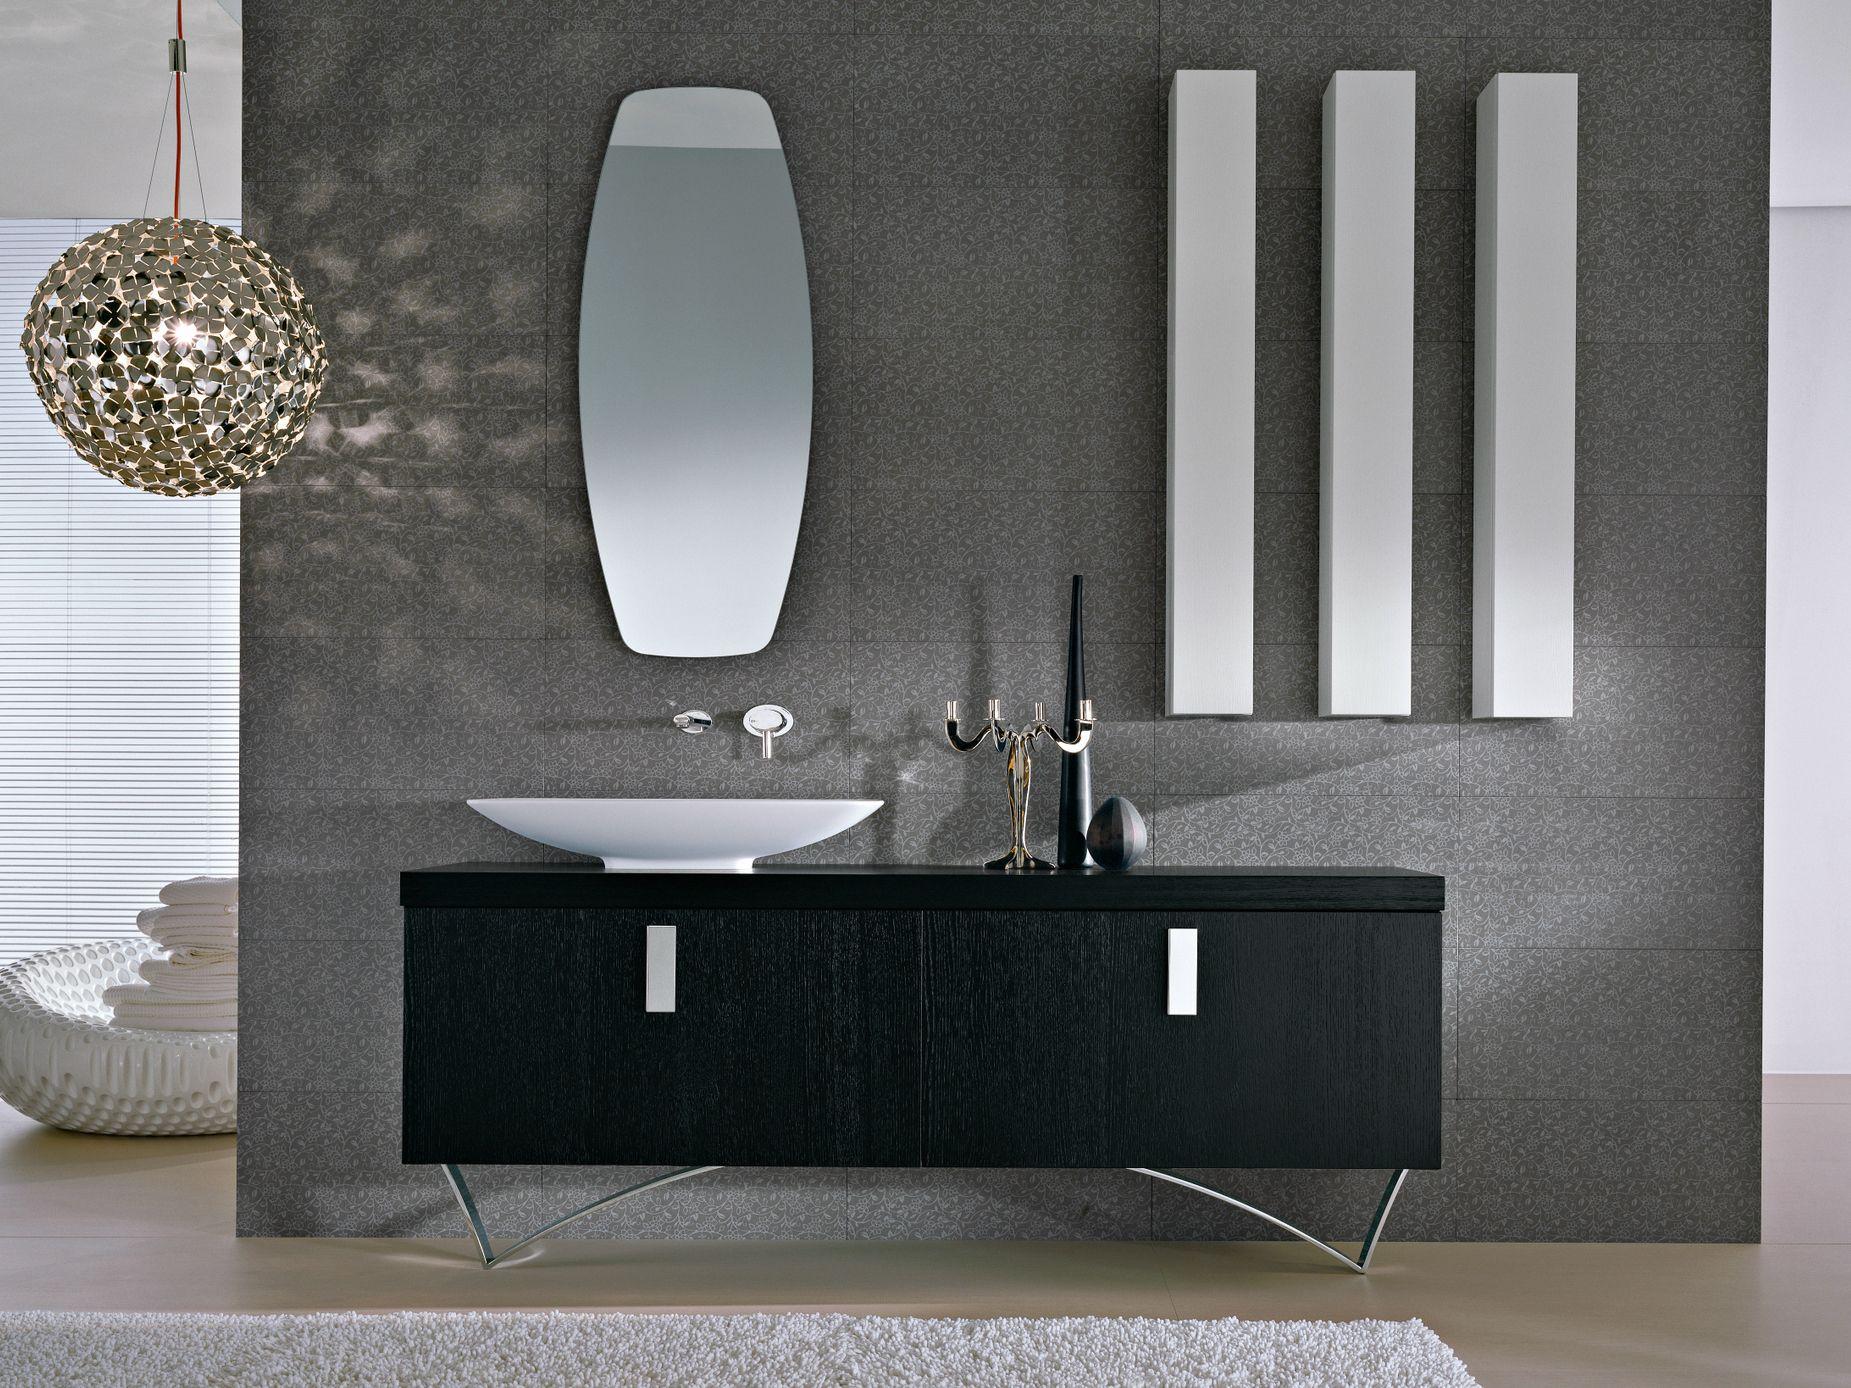 Mueble bajo lavabo de pi con espejo comp te5 colecci n - Mueble lavabo con pie ...